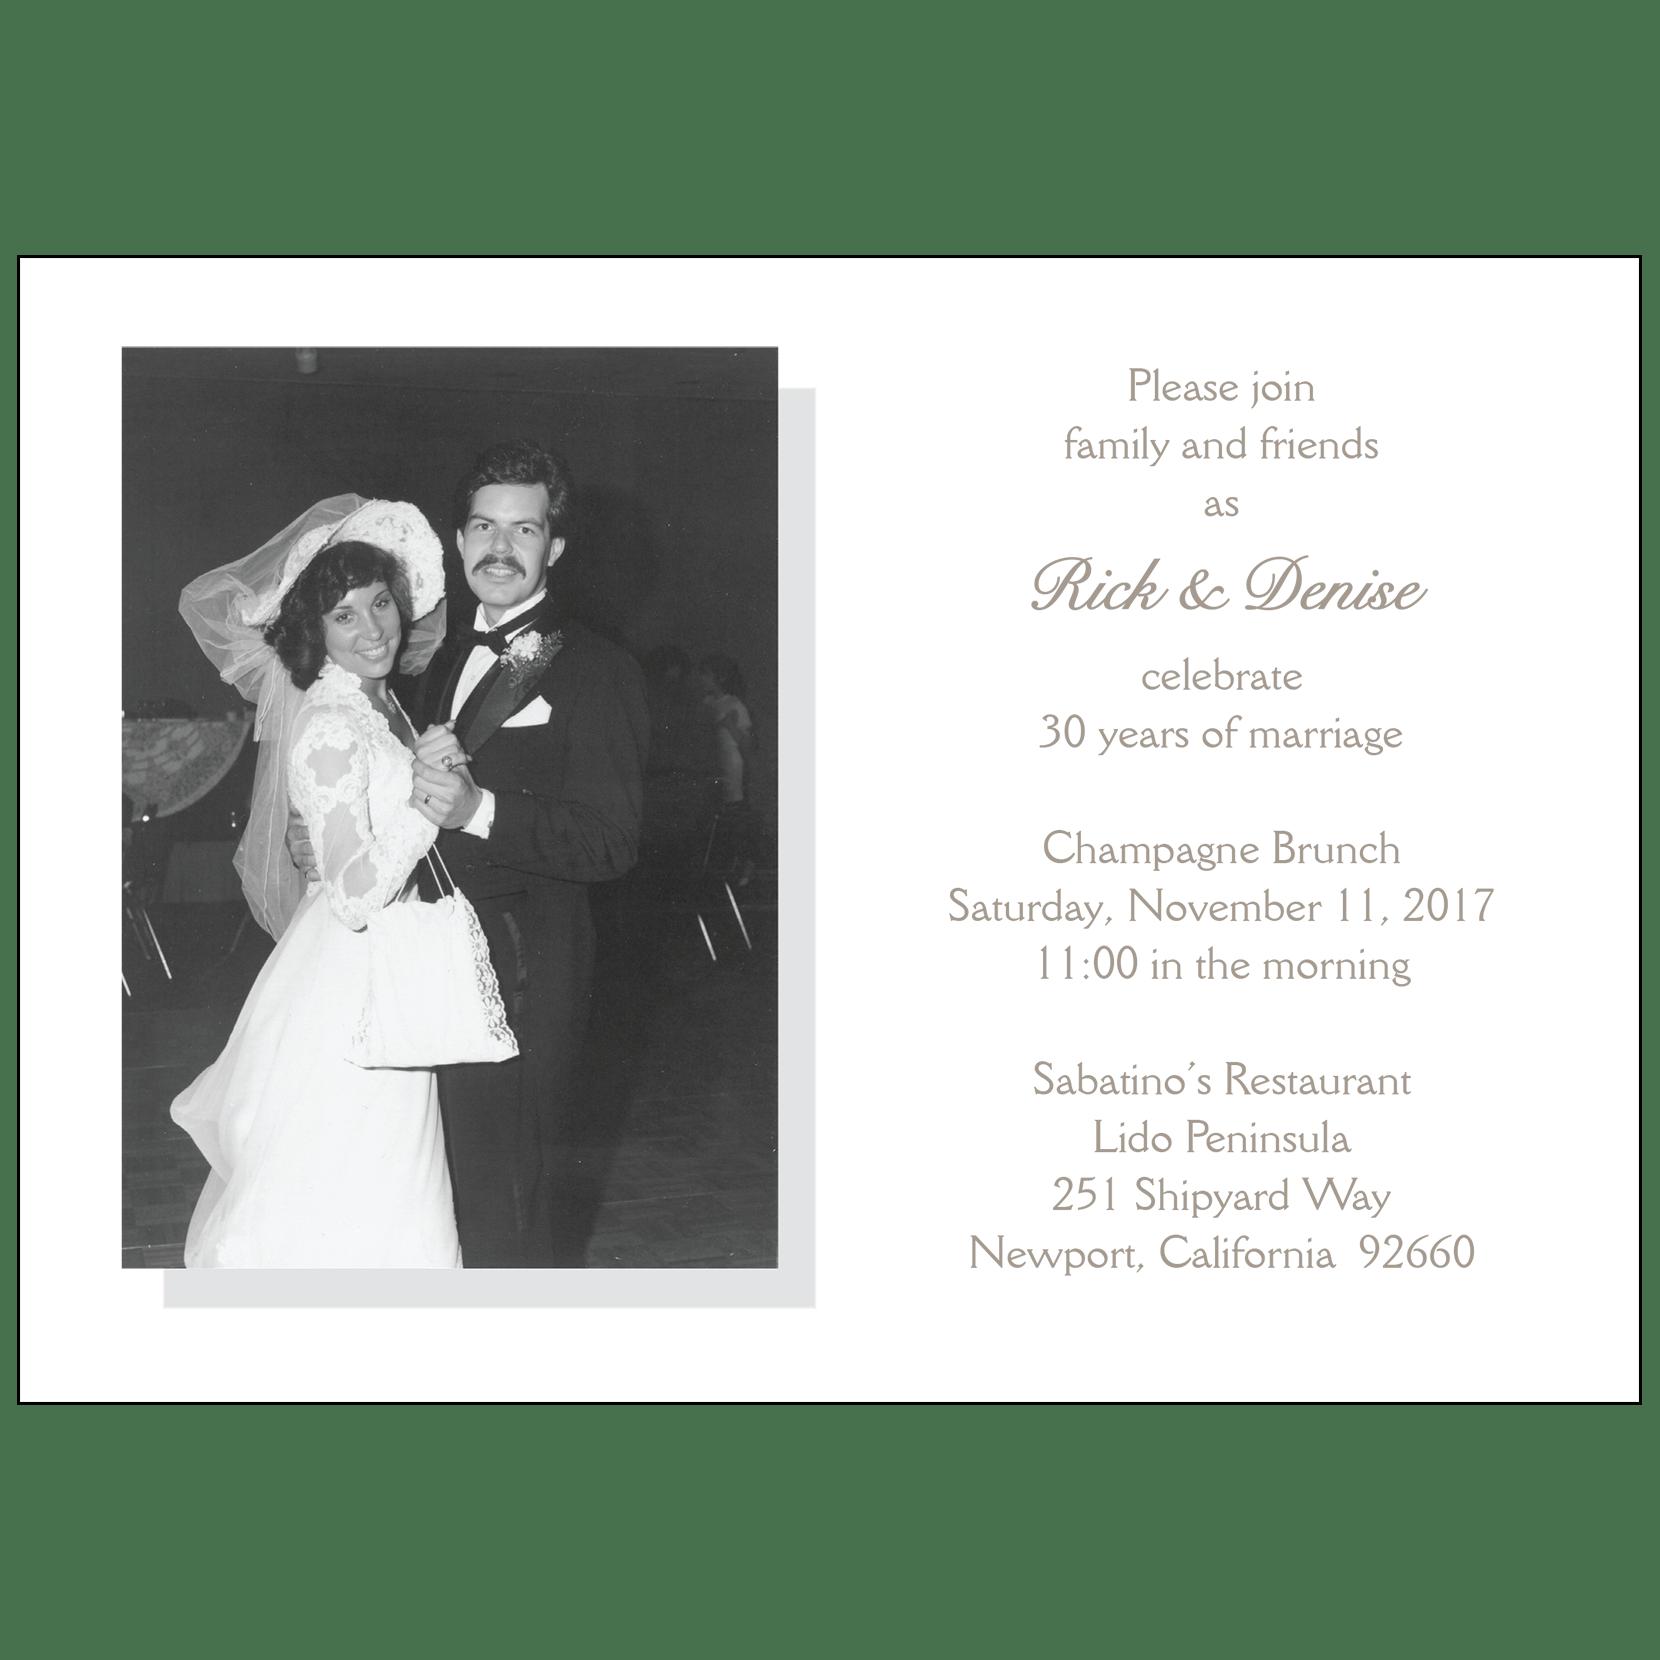 30th Wedding Anniversary Invitations: 30th Wedding Anniversary Party Invitation, Style 2 Sample